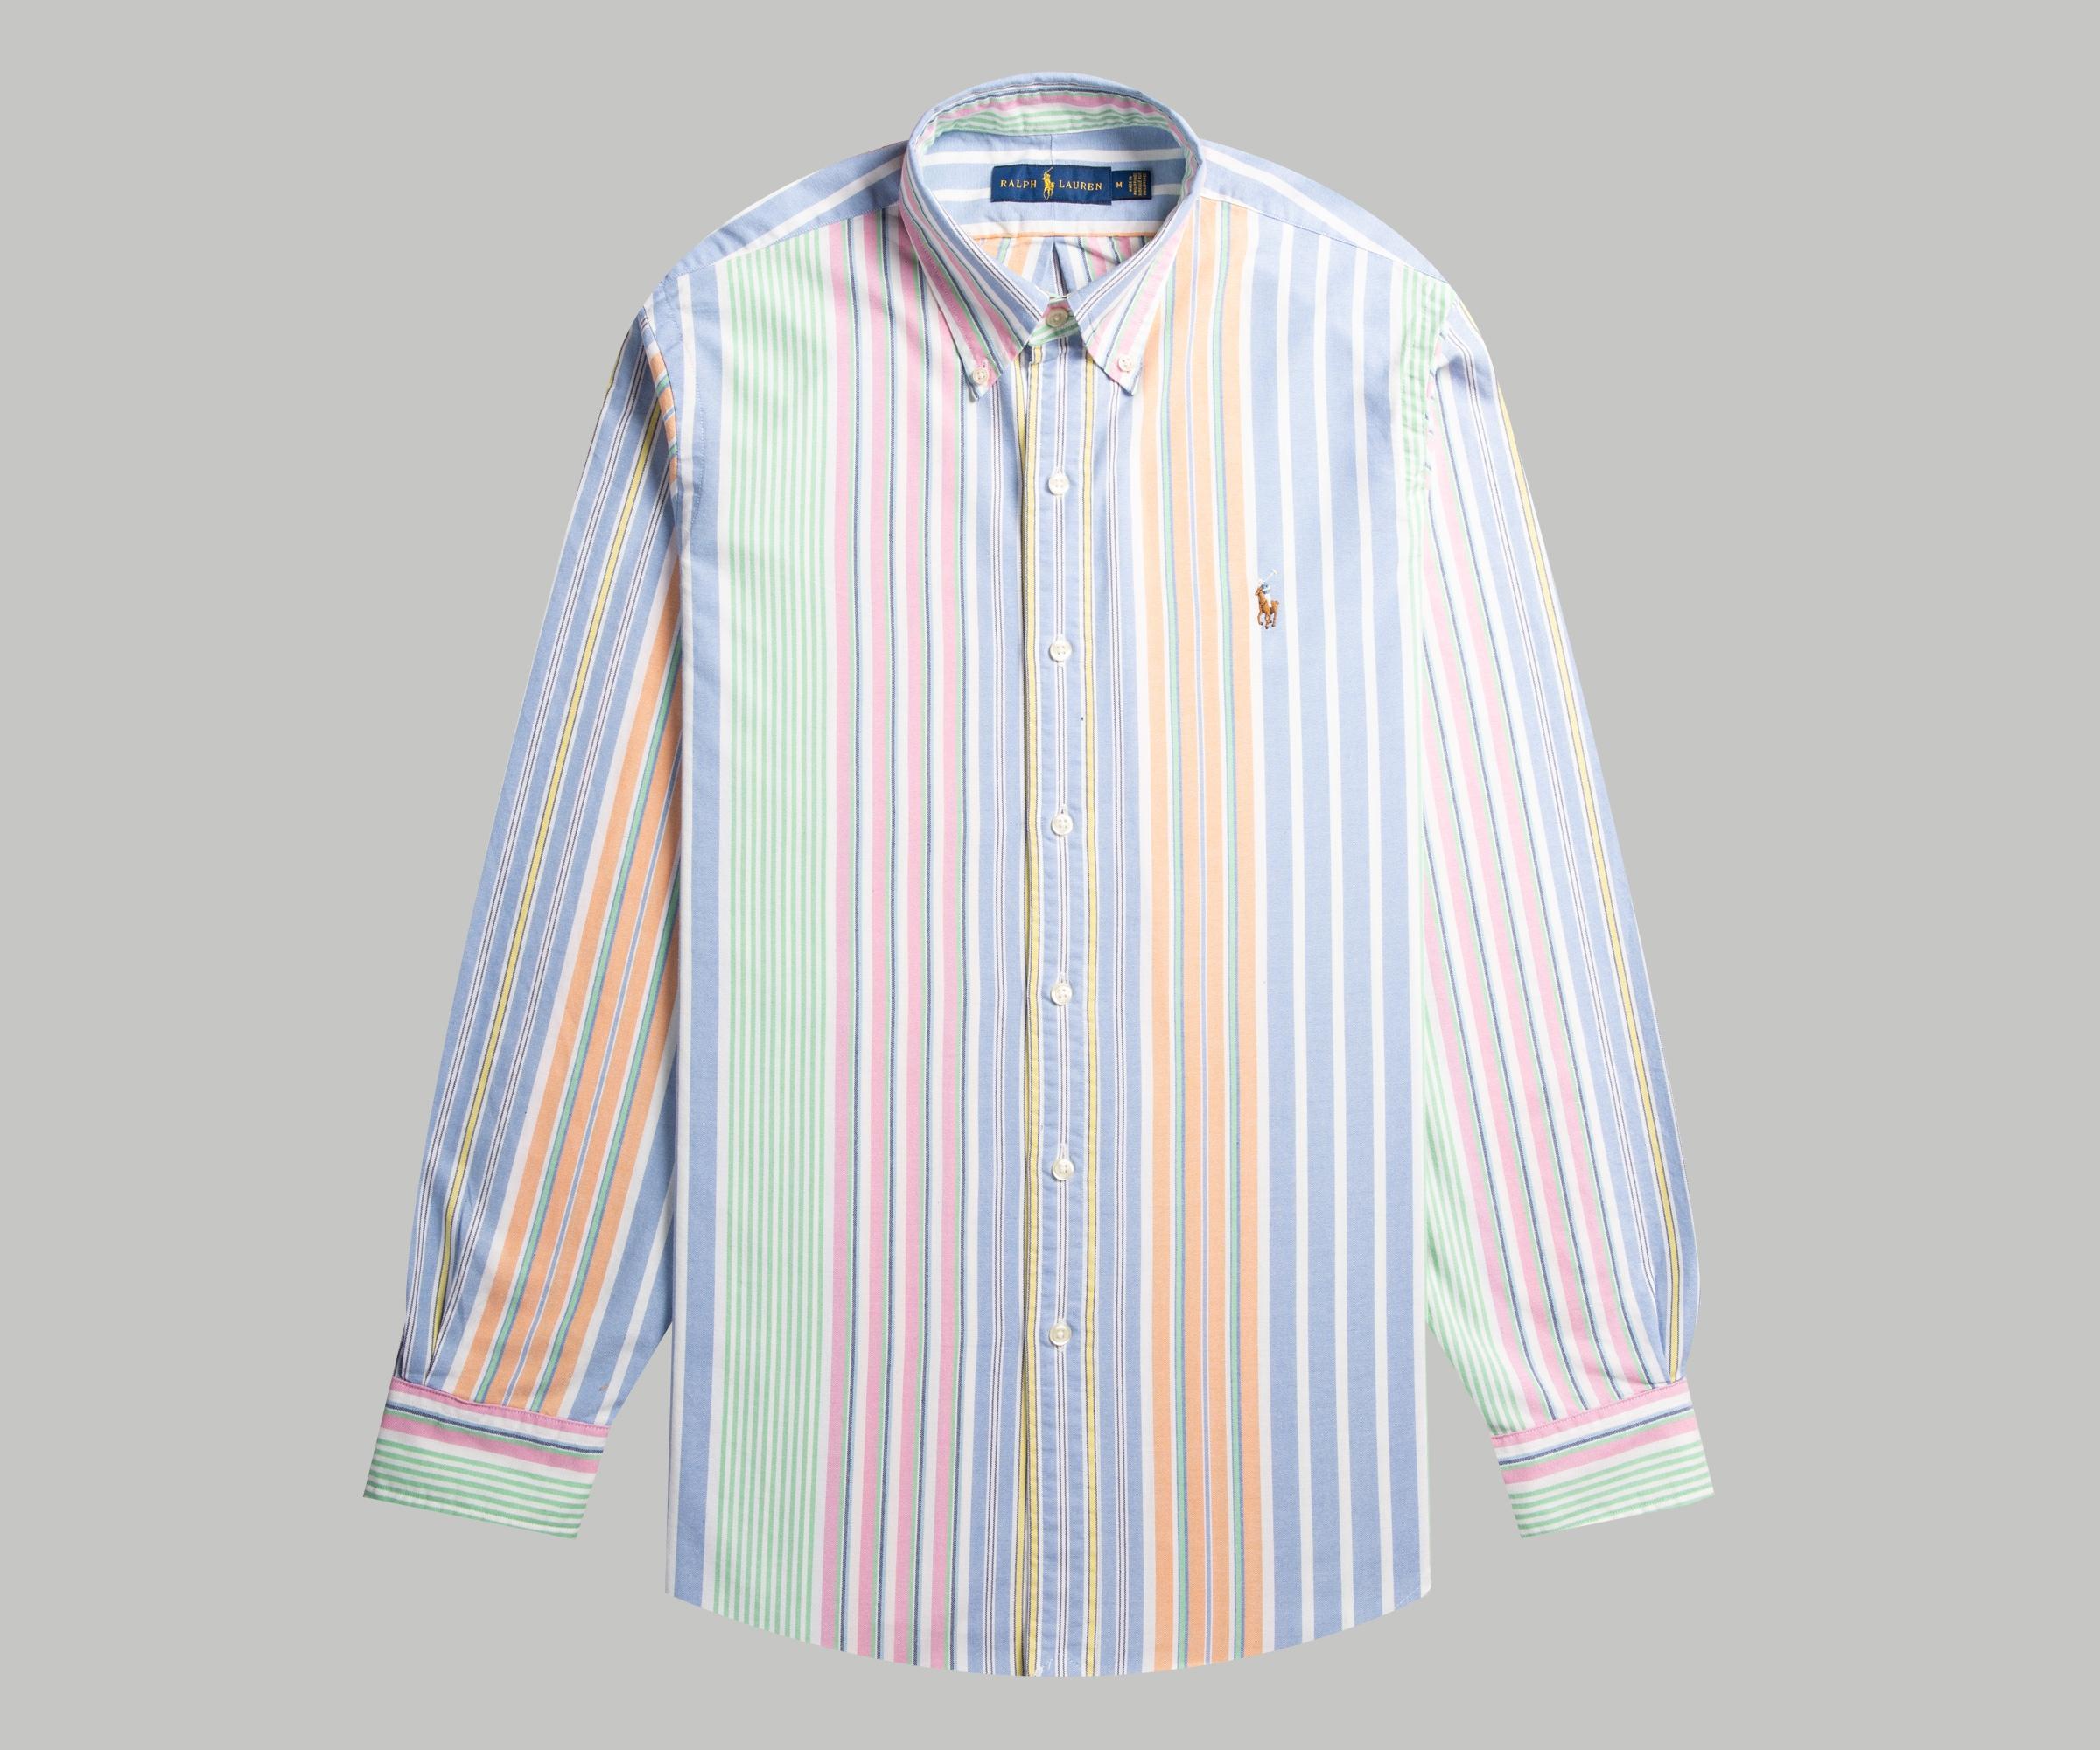 Polo Ralph Lauren Multi-Striped Oxford Shirt   Polo ralph